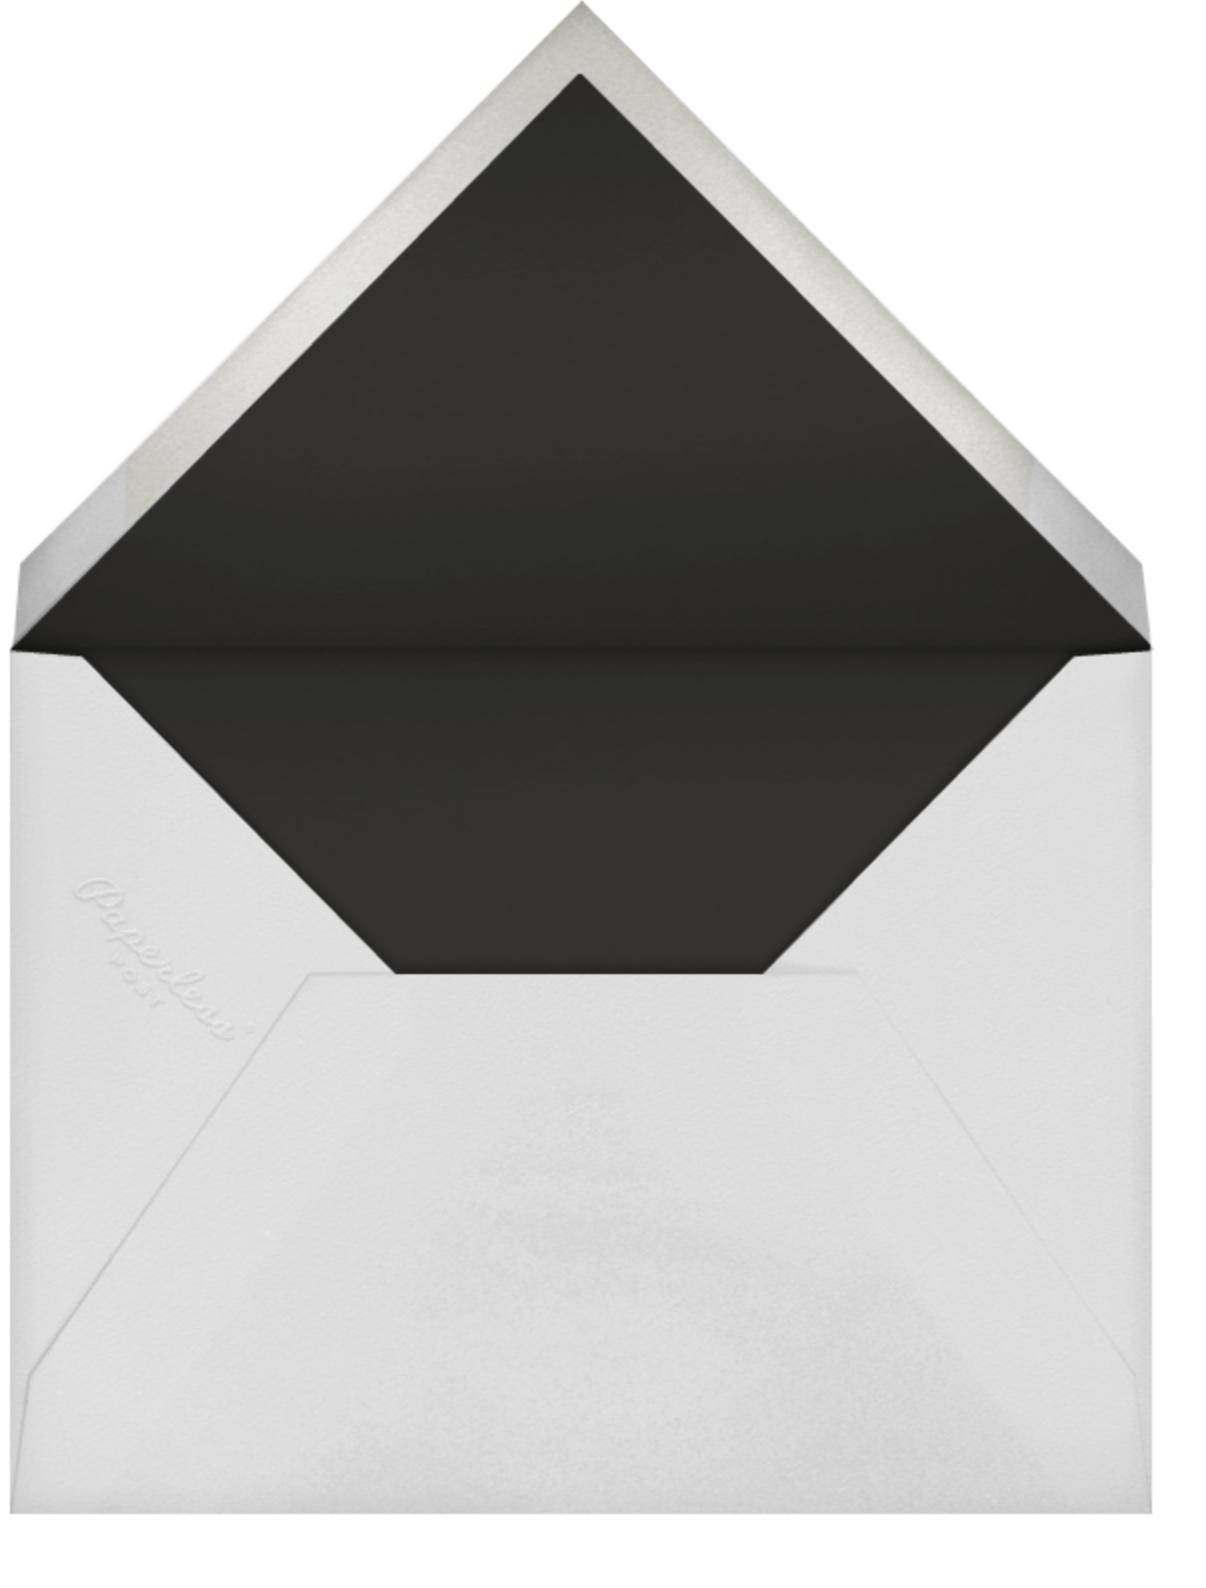 Pearl Embroidery (Tall) - Silver - Oscar de la Renta - Engagement party - envelope back